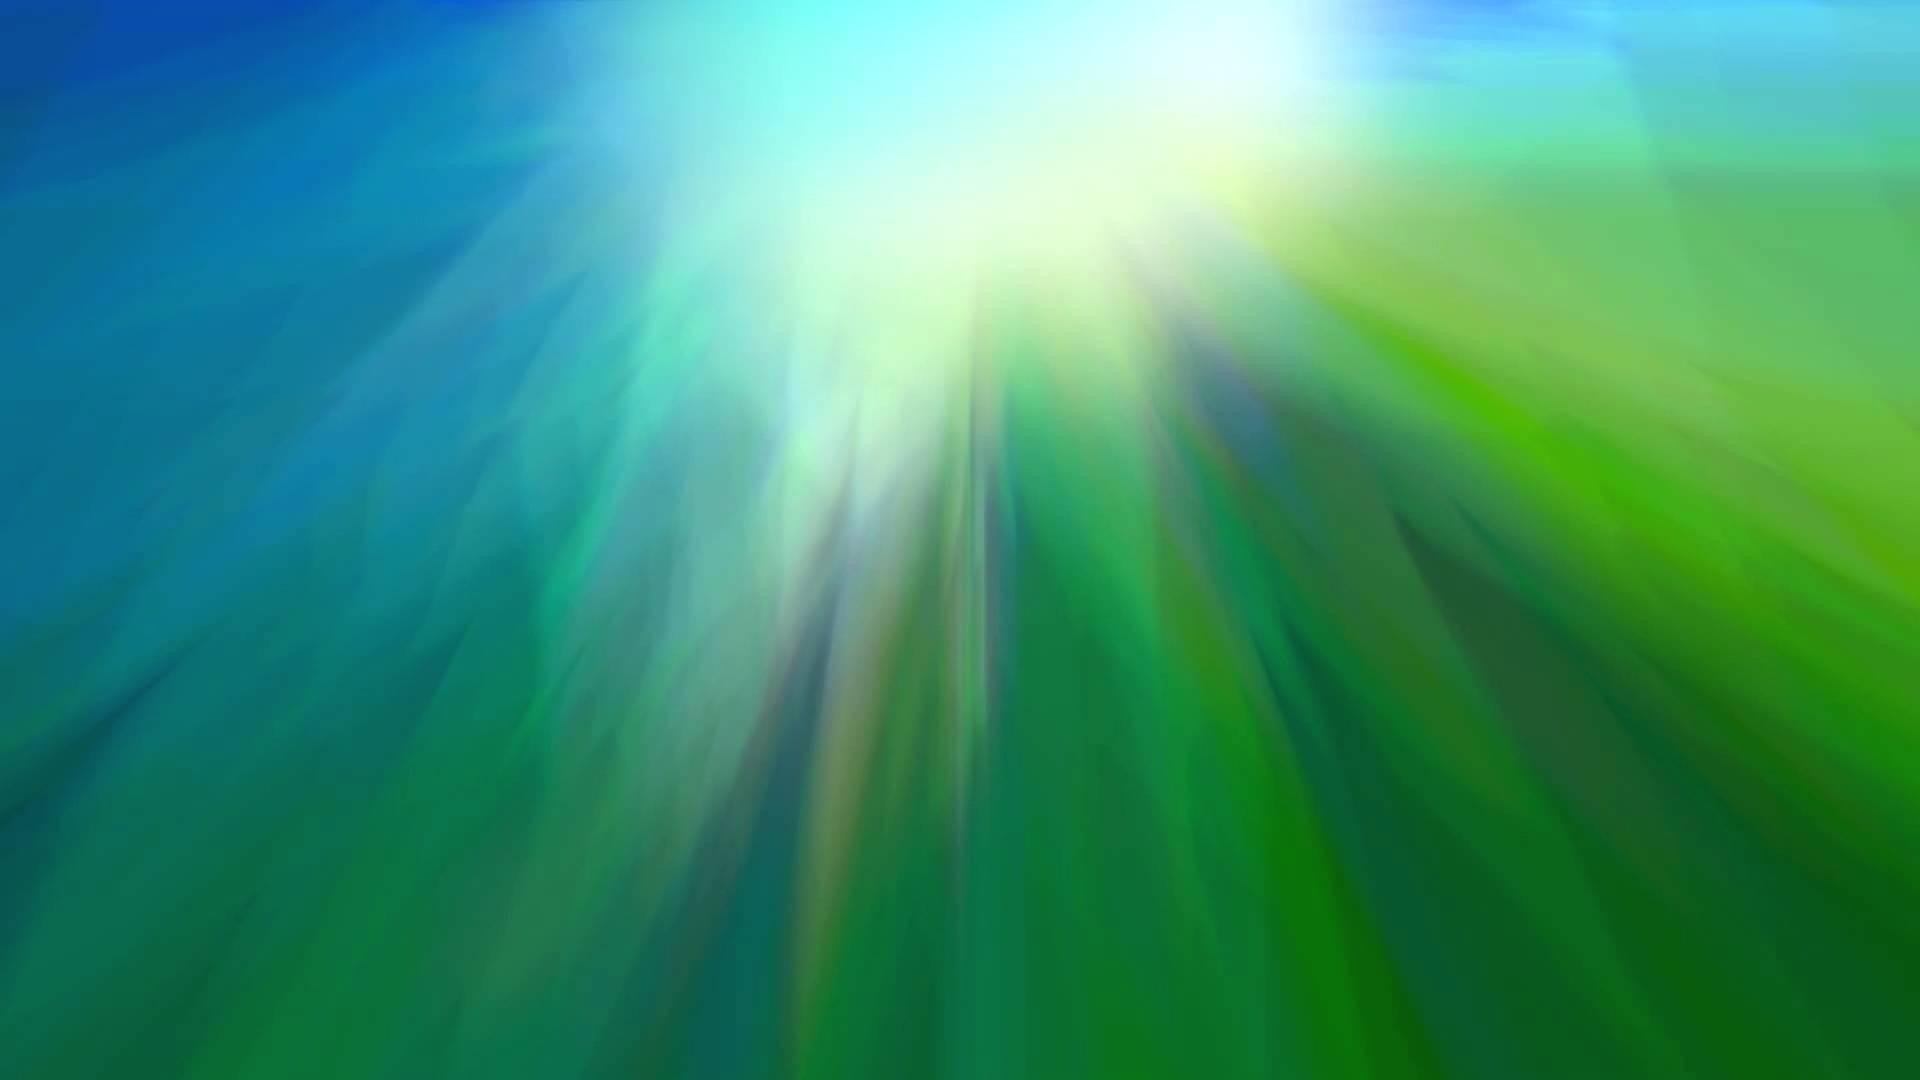 1920x1080 green blue wavy light vapor background download light green and blue background